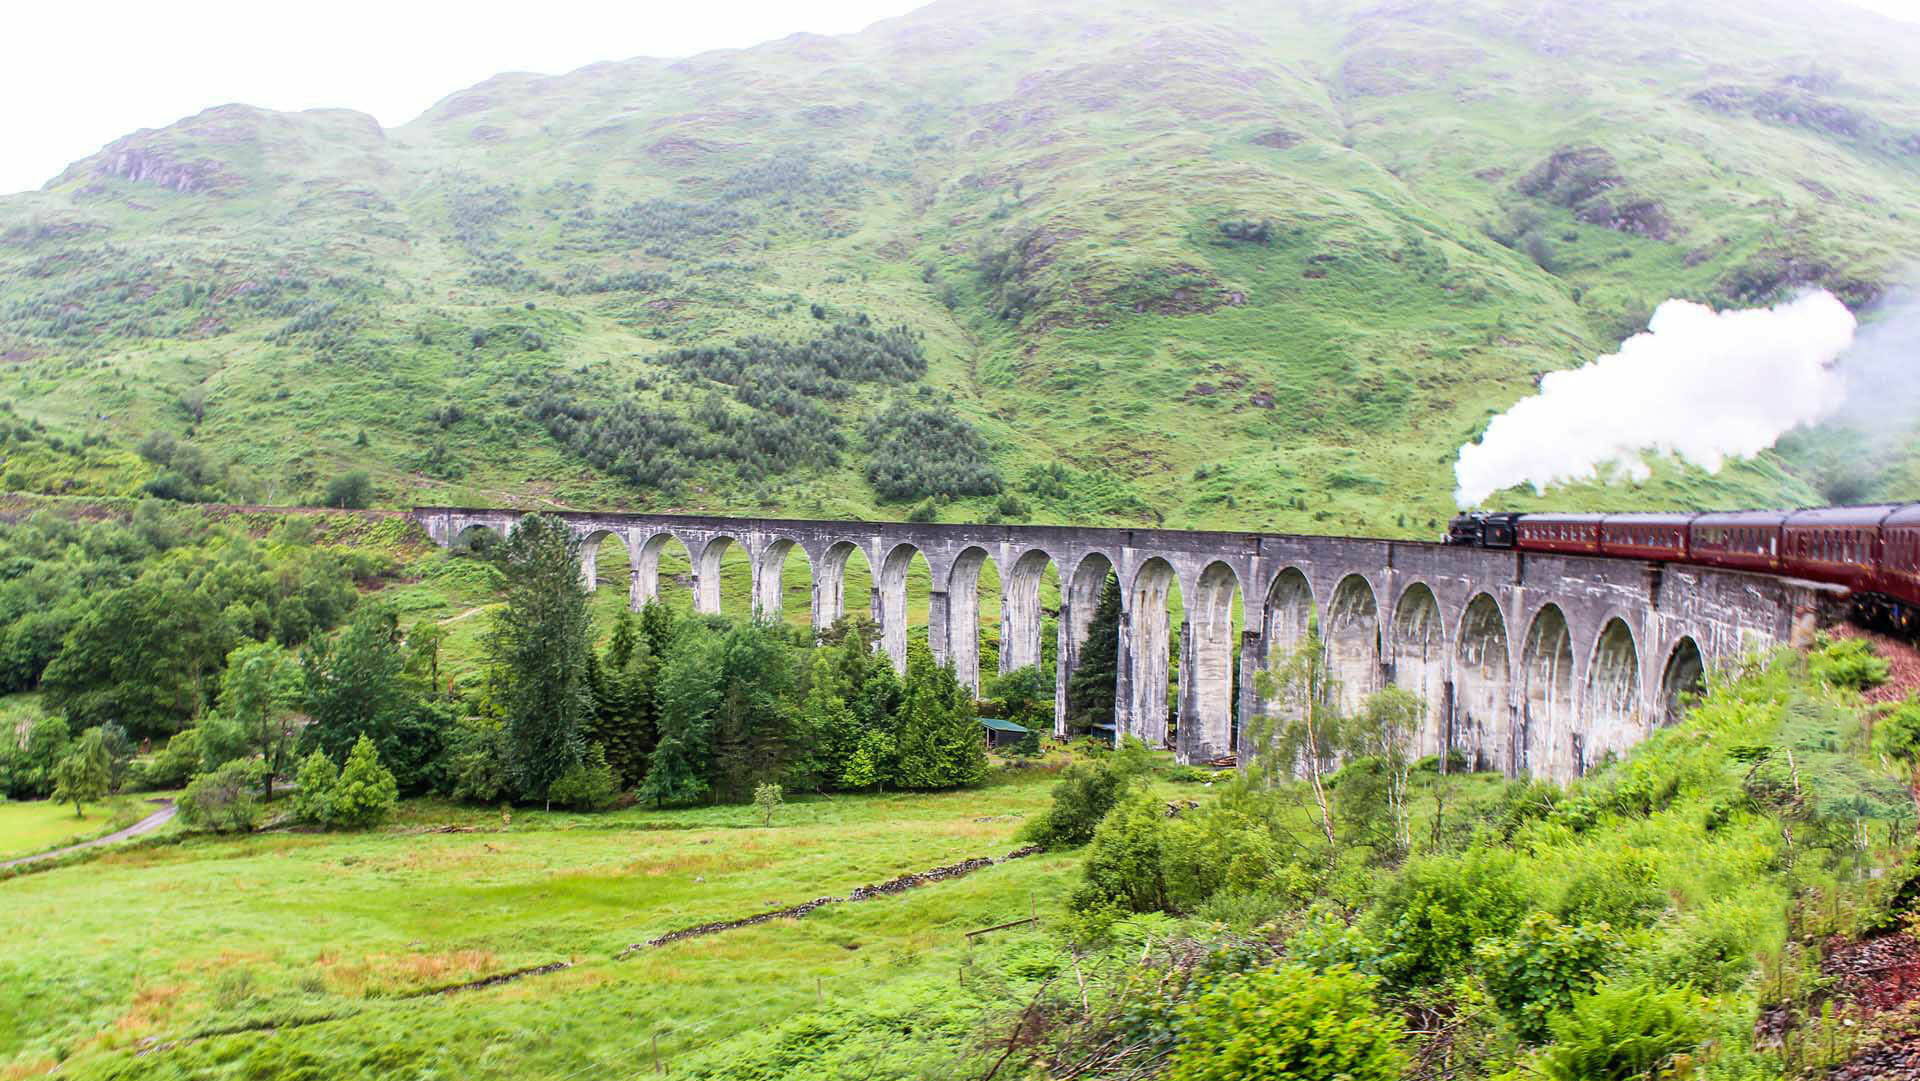 Scotland Glenfinnan Viaduct